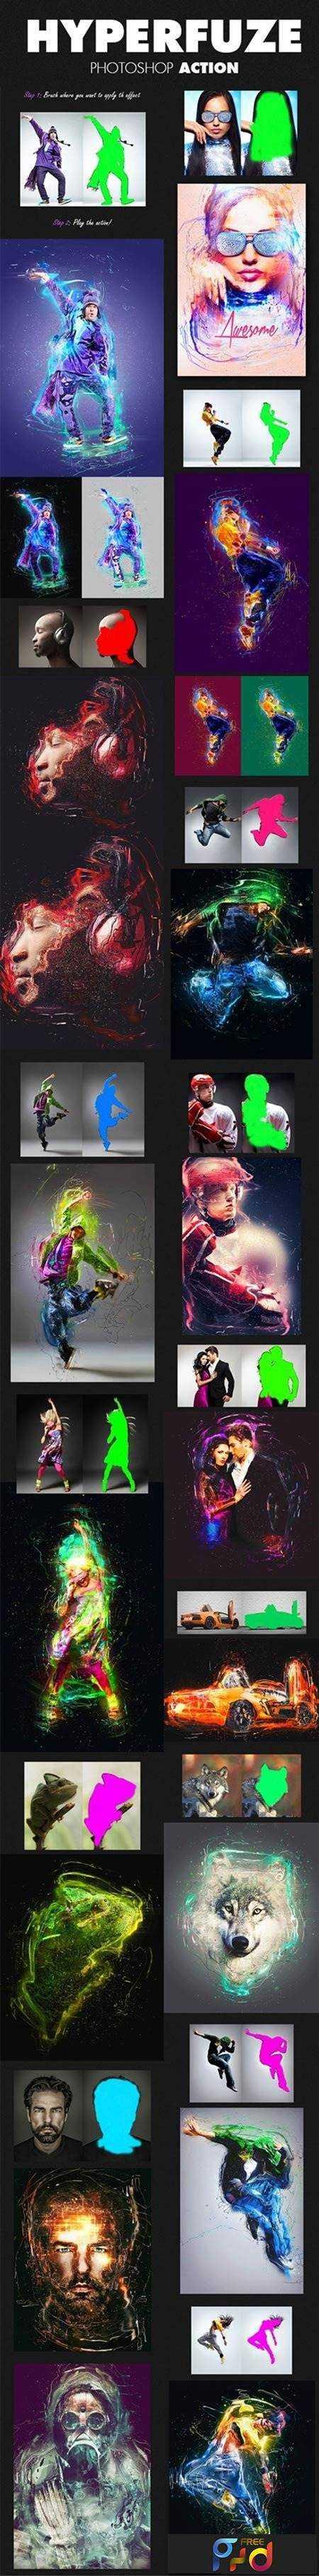 FreePsdVn.com_1702215_PHOTOSHOP_hyperfuze_photoshop_action_8769882